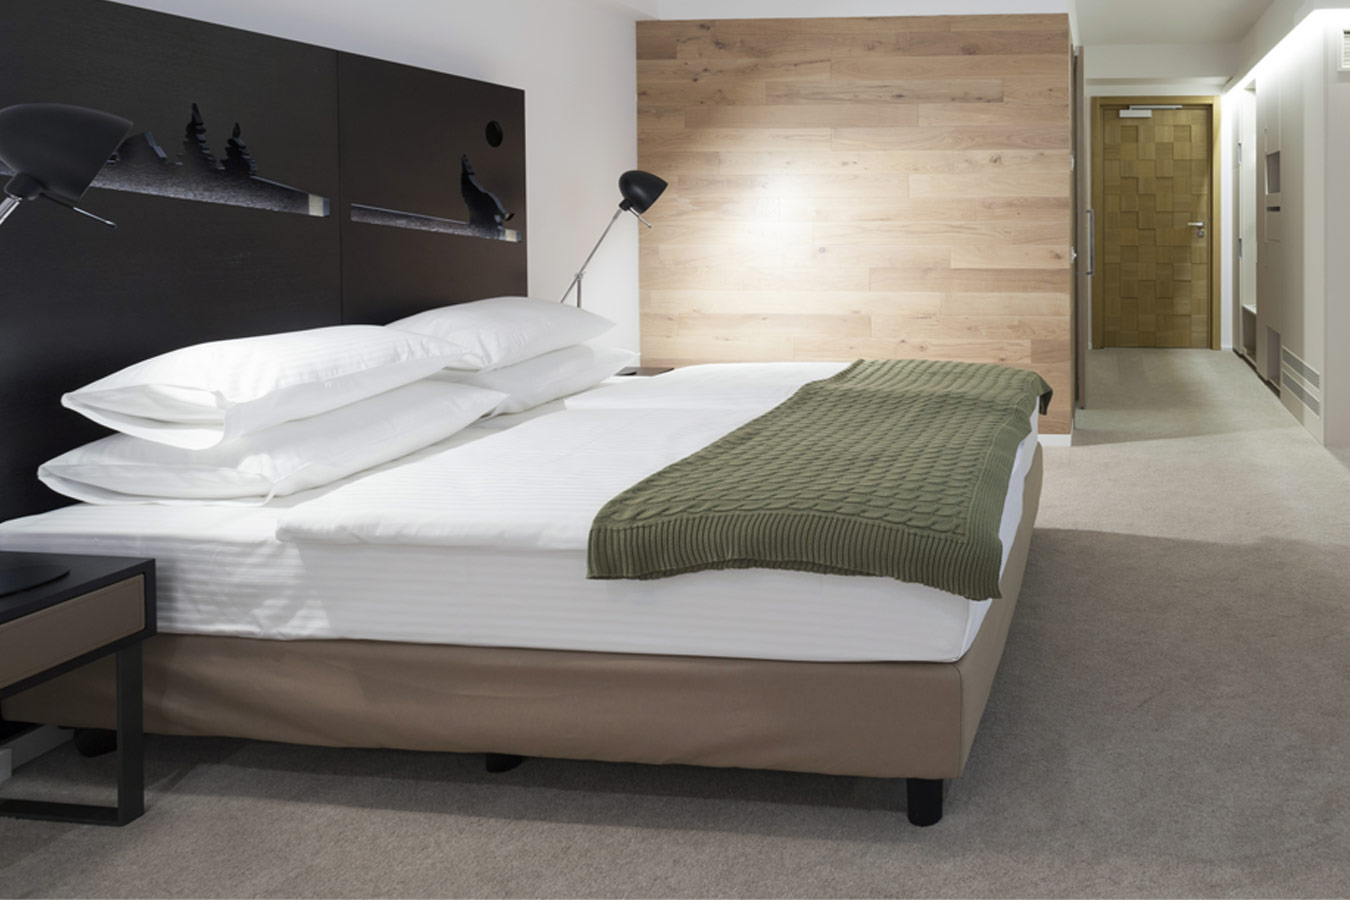 moderne slaapkamer idee235n amp inspiratie